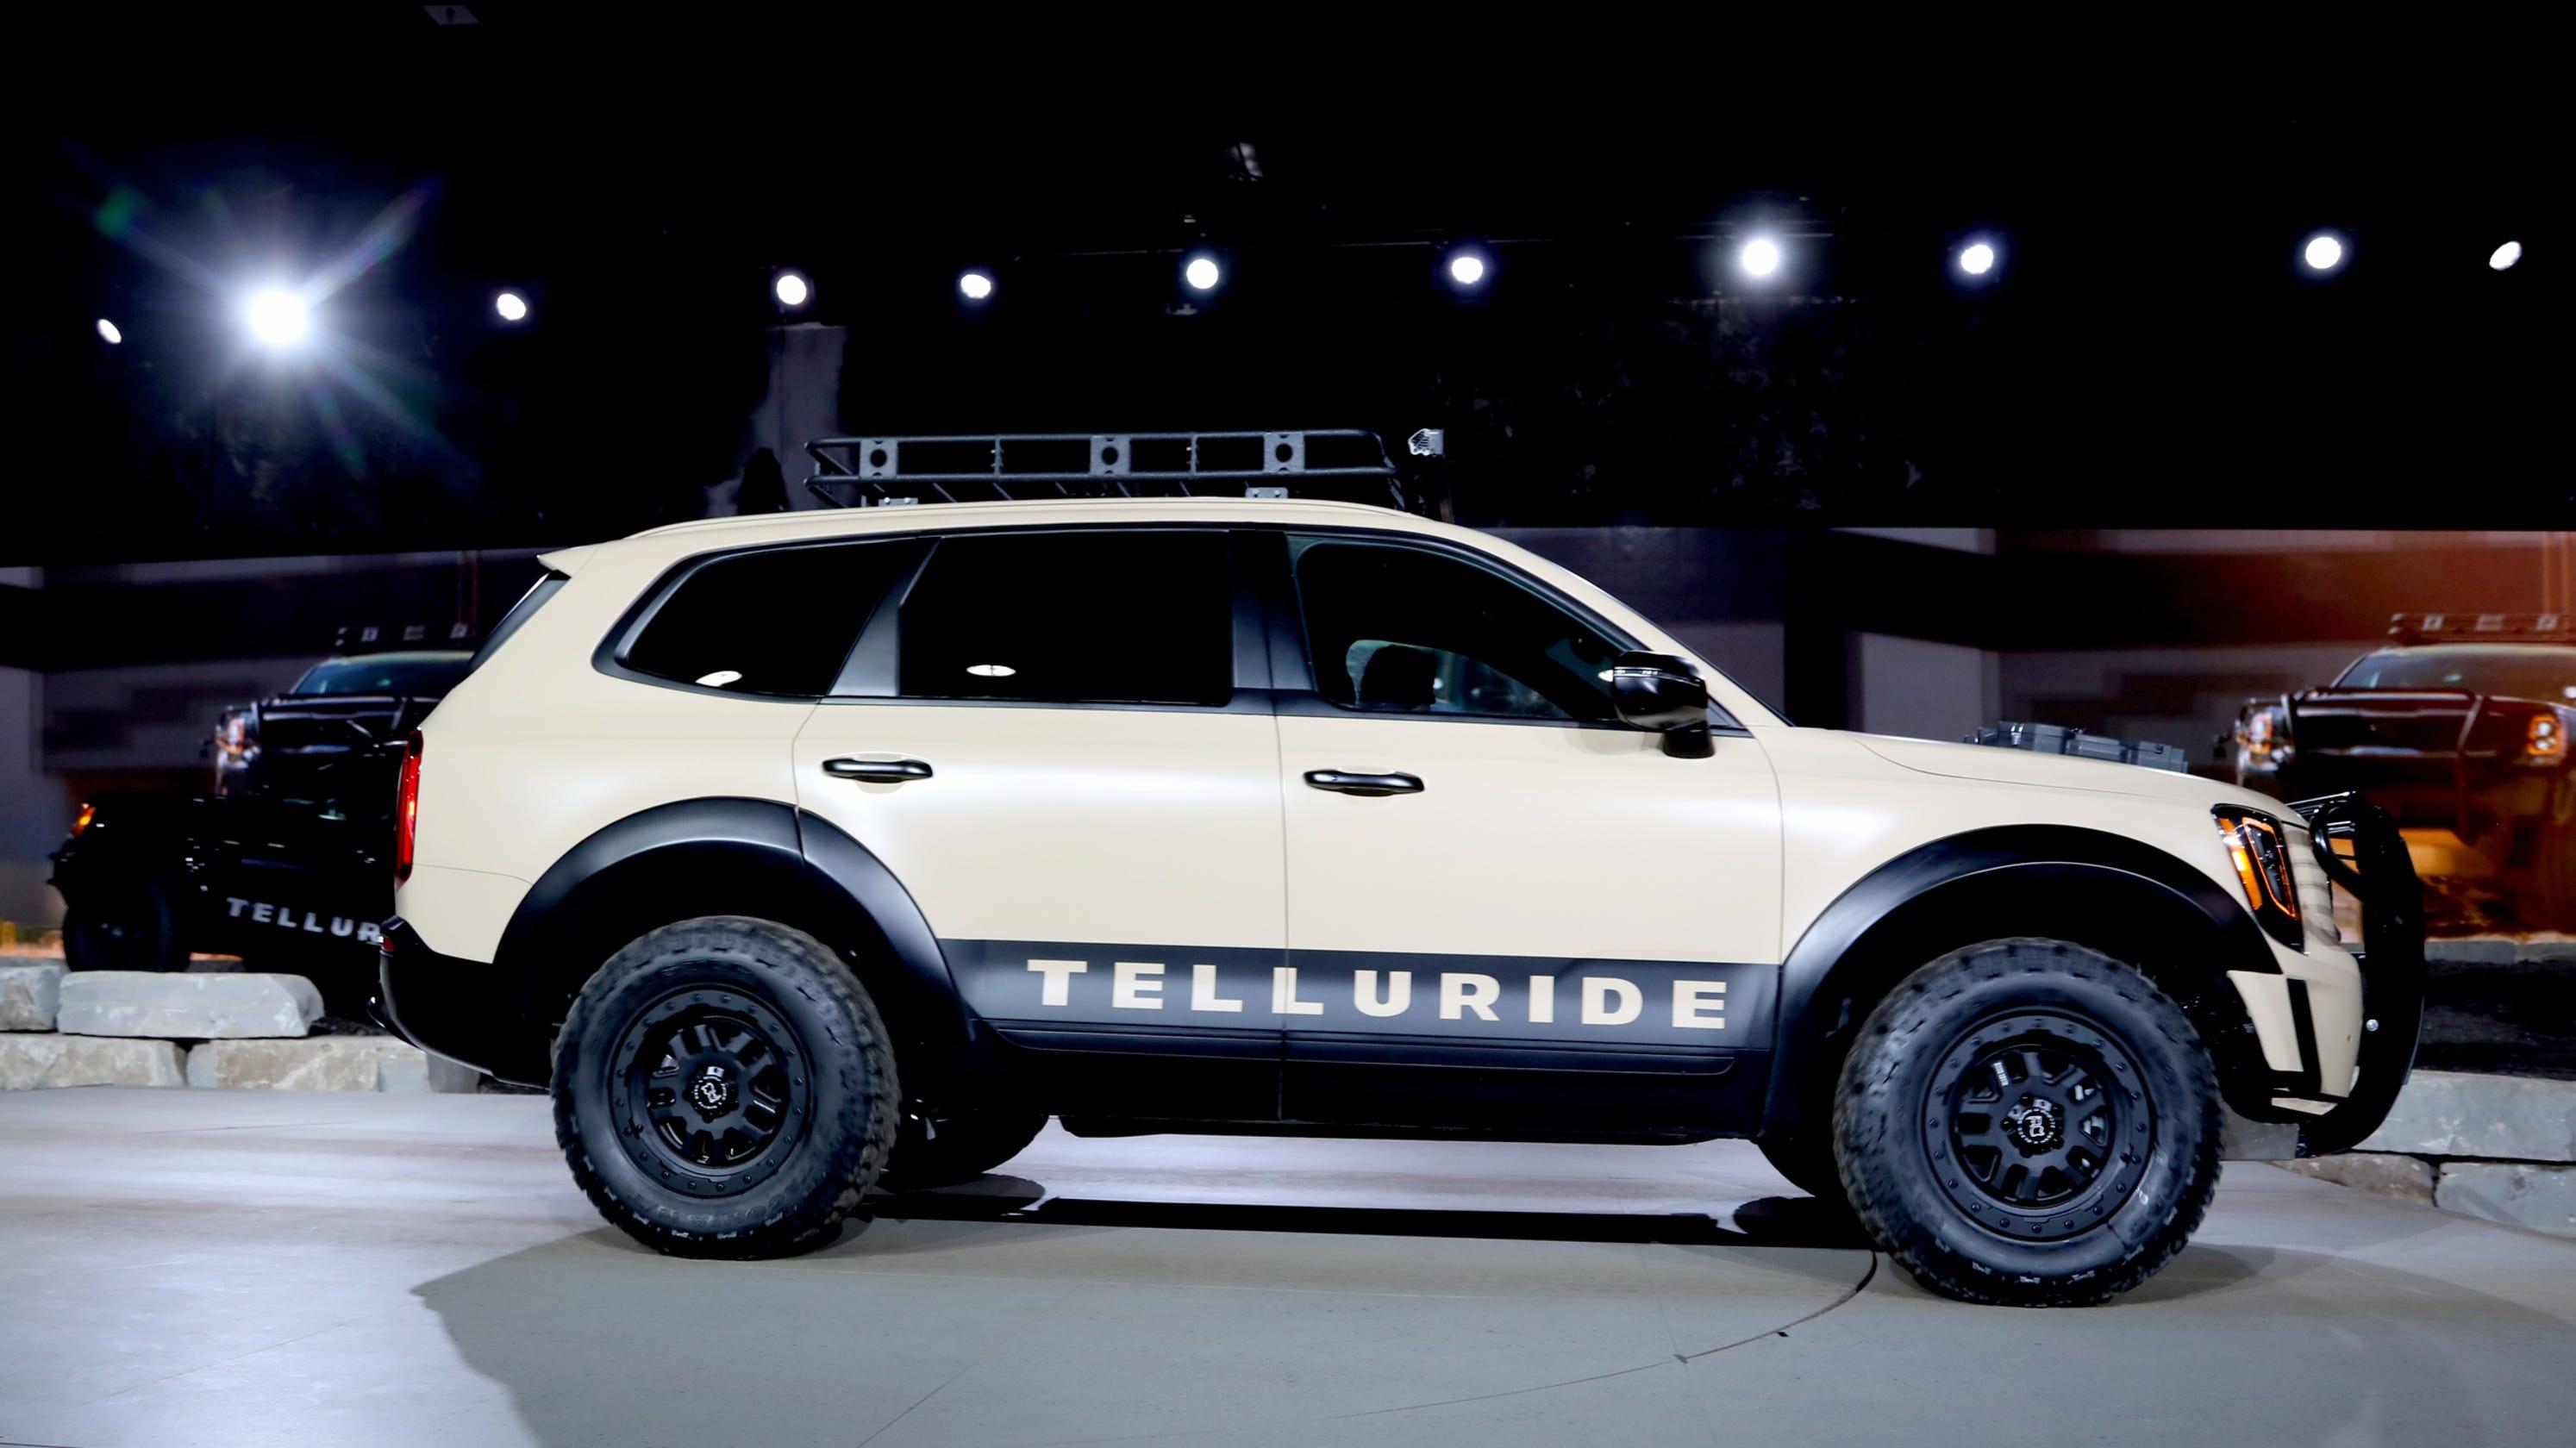 Kia Bill Pay >> Kia Telluride: Its largest SUV revealed at Detroit auto show